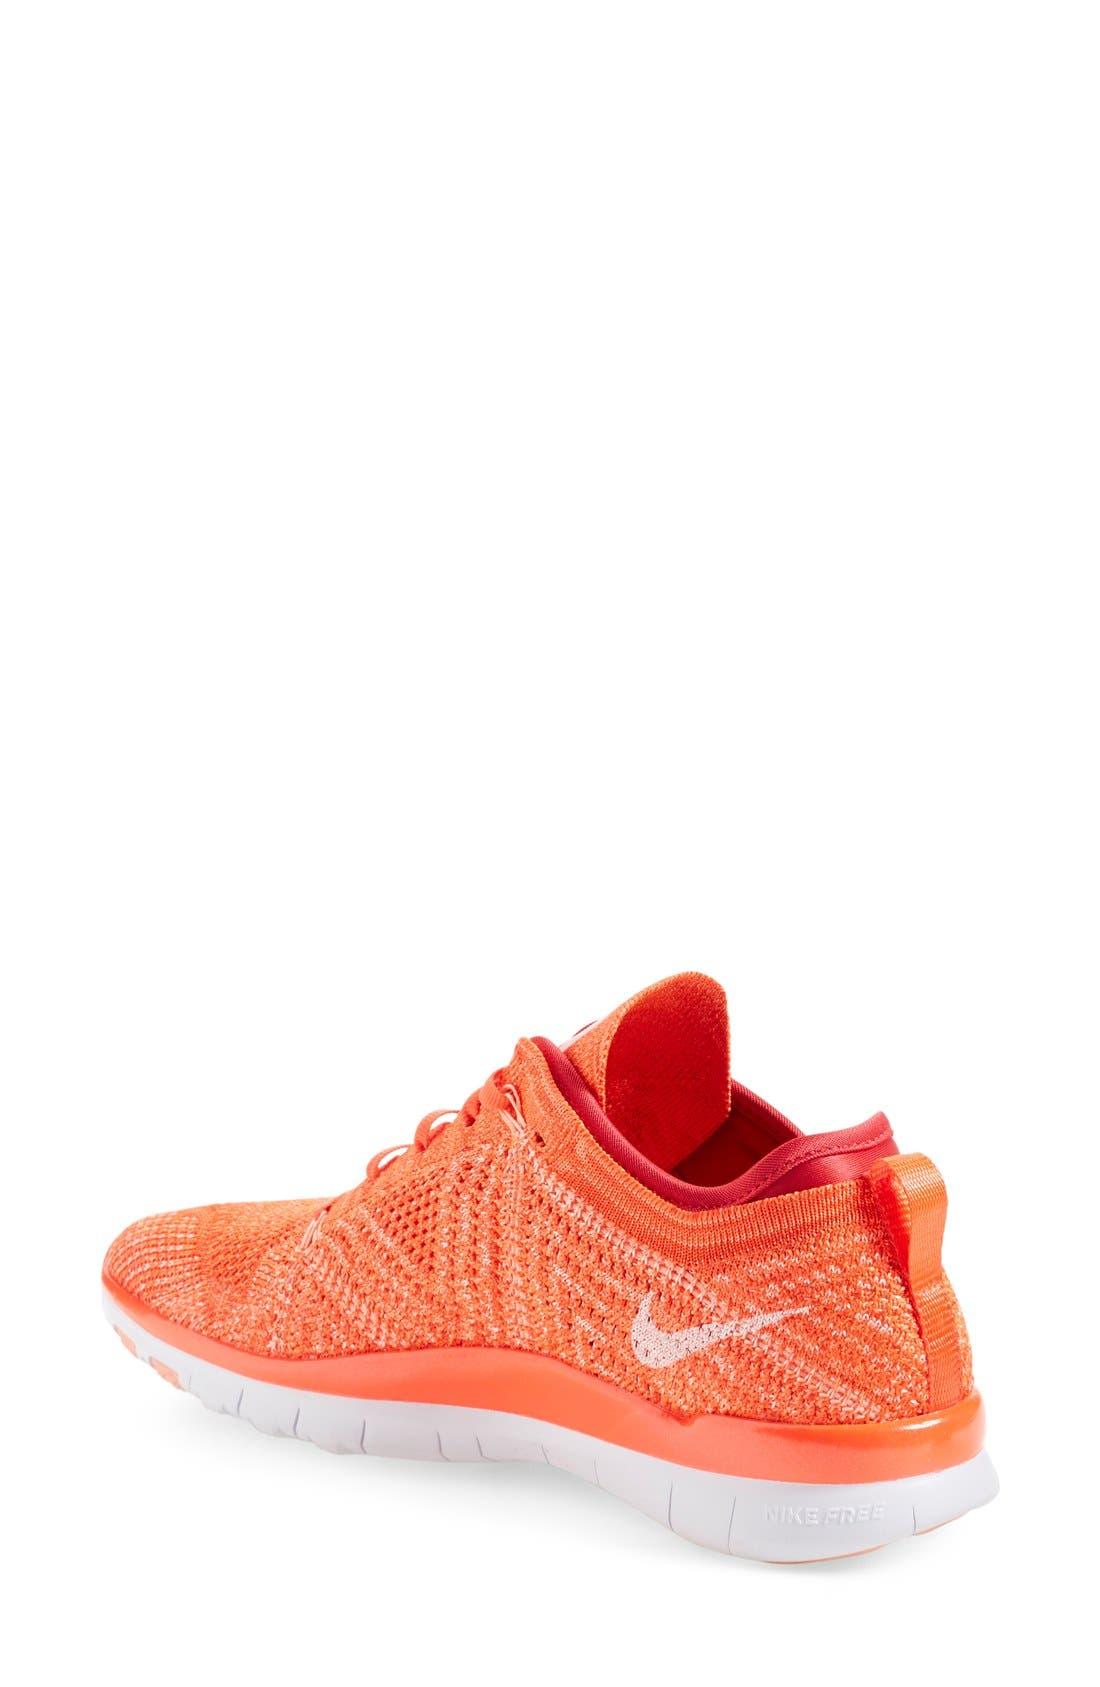 ,                             'Free Flyknit 5.0 TR' Training Shoe,                             Alternate thumbnail 66, color,                             897